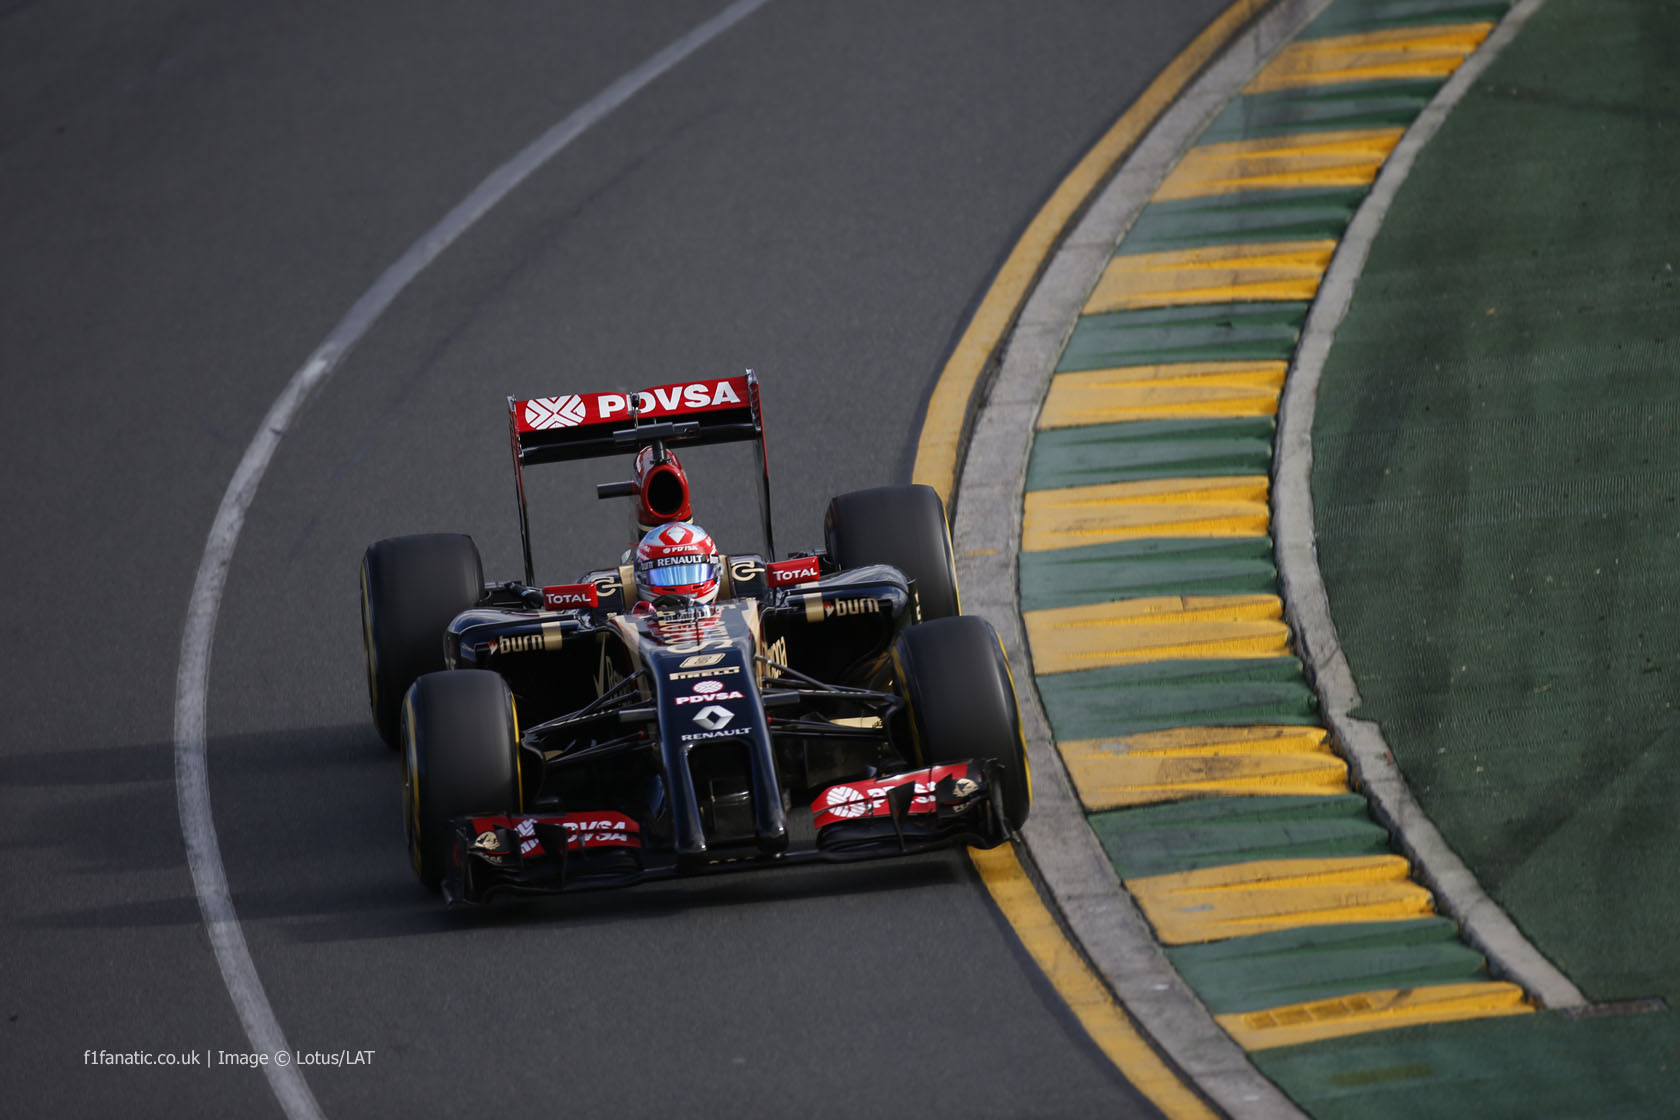 Romain Grosjean, Lotus, Albert Park, 2014